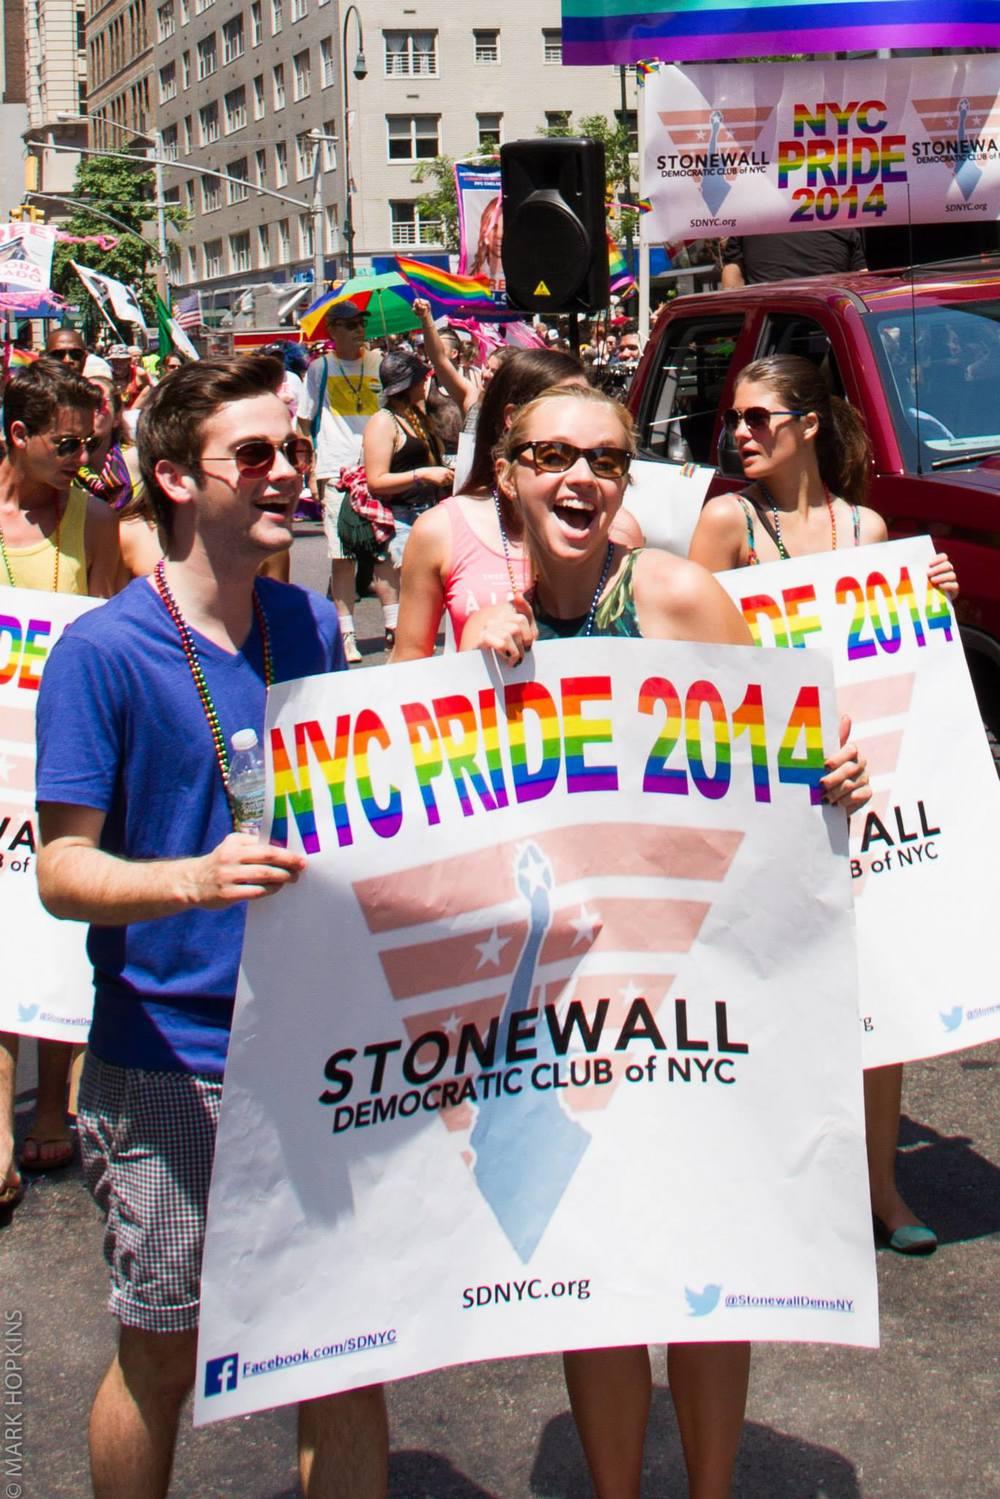 NYC Pride 2014 - Photo Credit: Mark Hopkins Photography